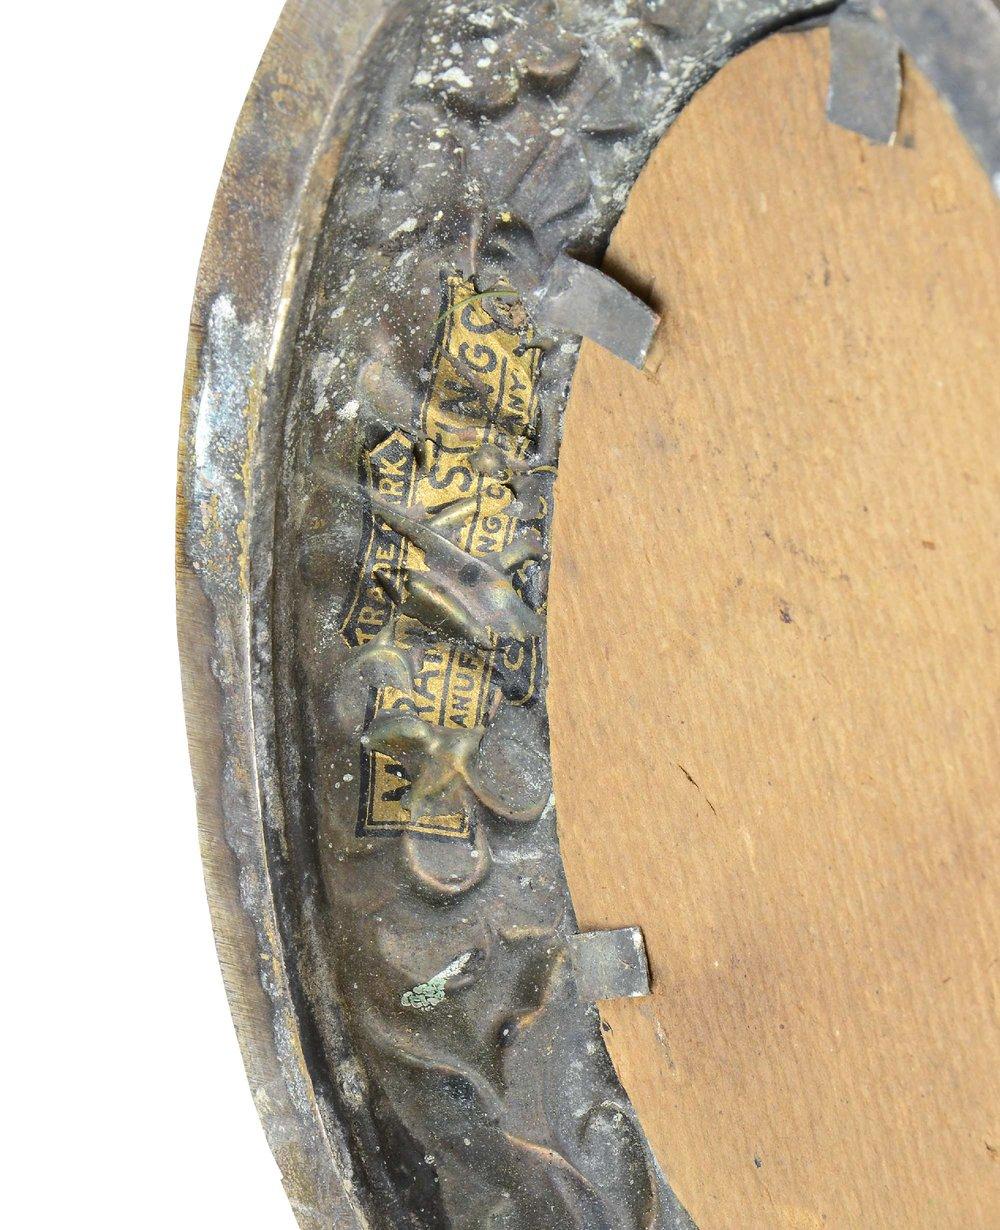 46800-moran-hastings-silver-mirror-sconce-maker-mark.jpg